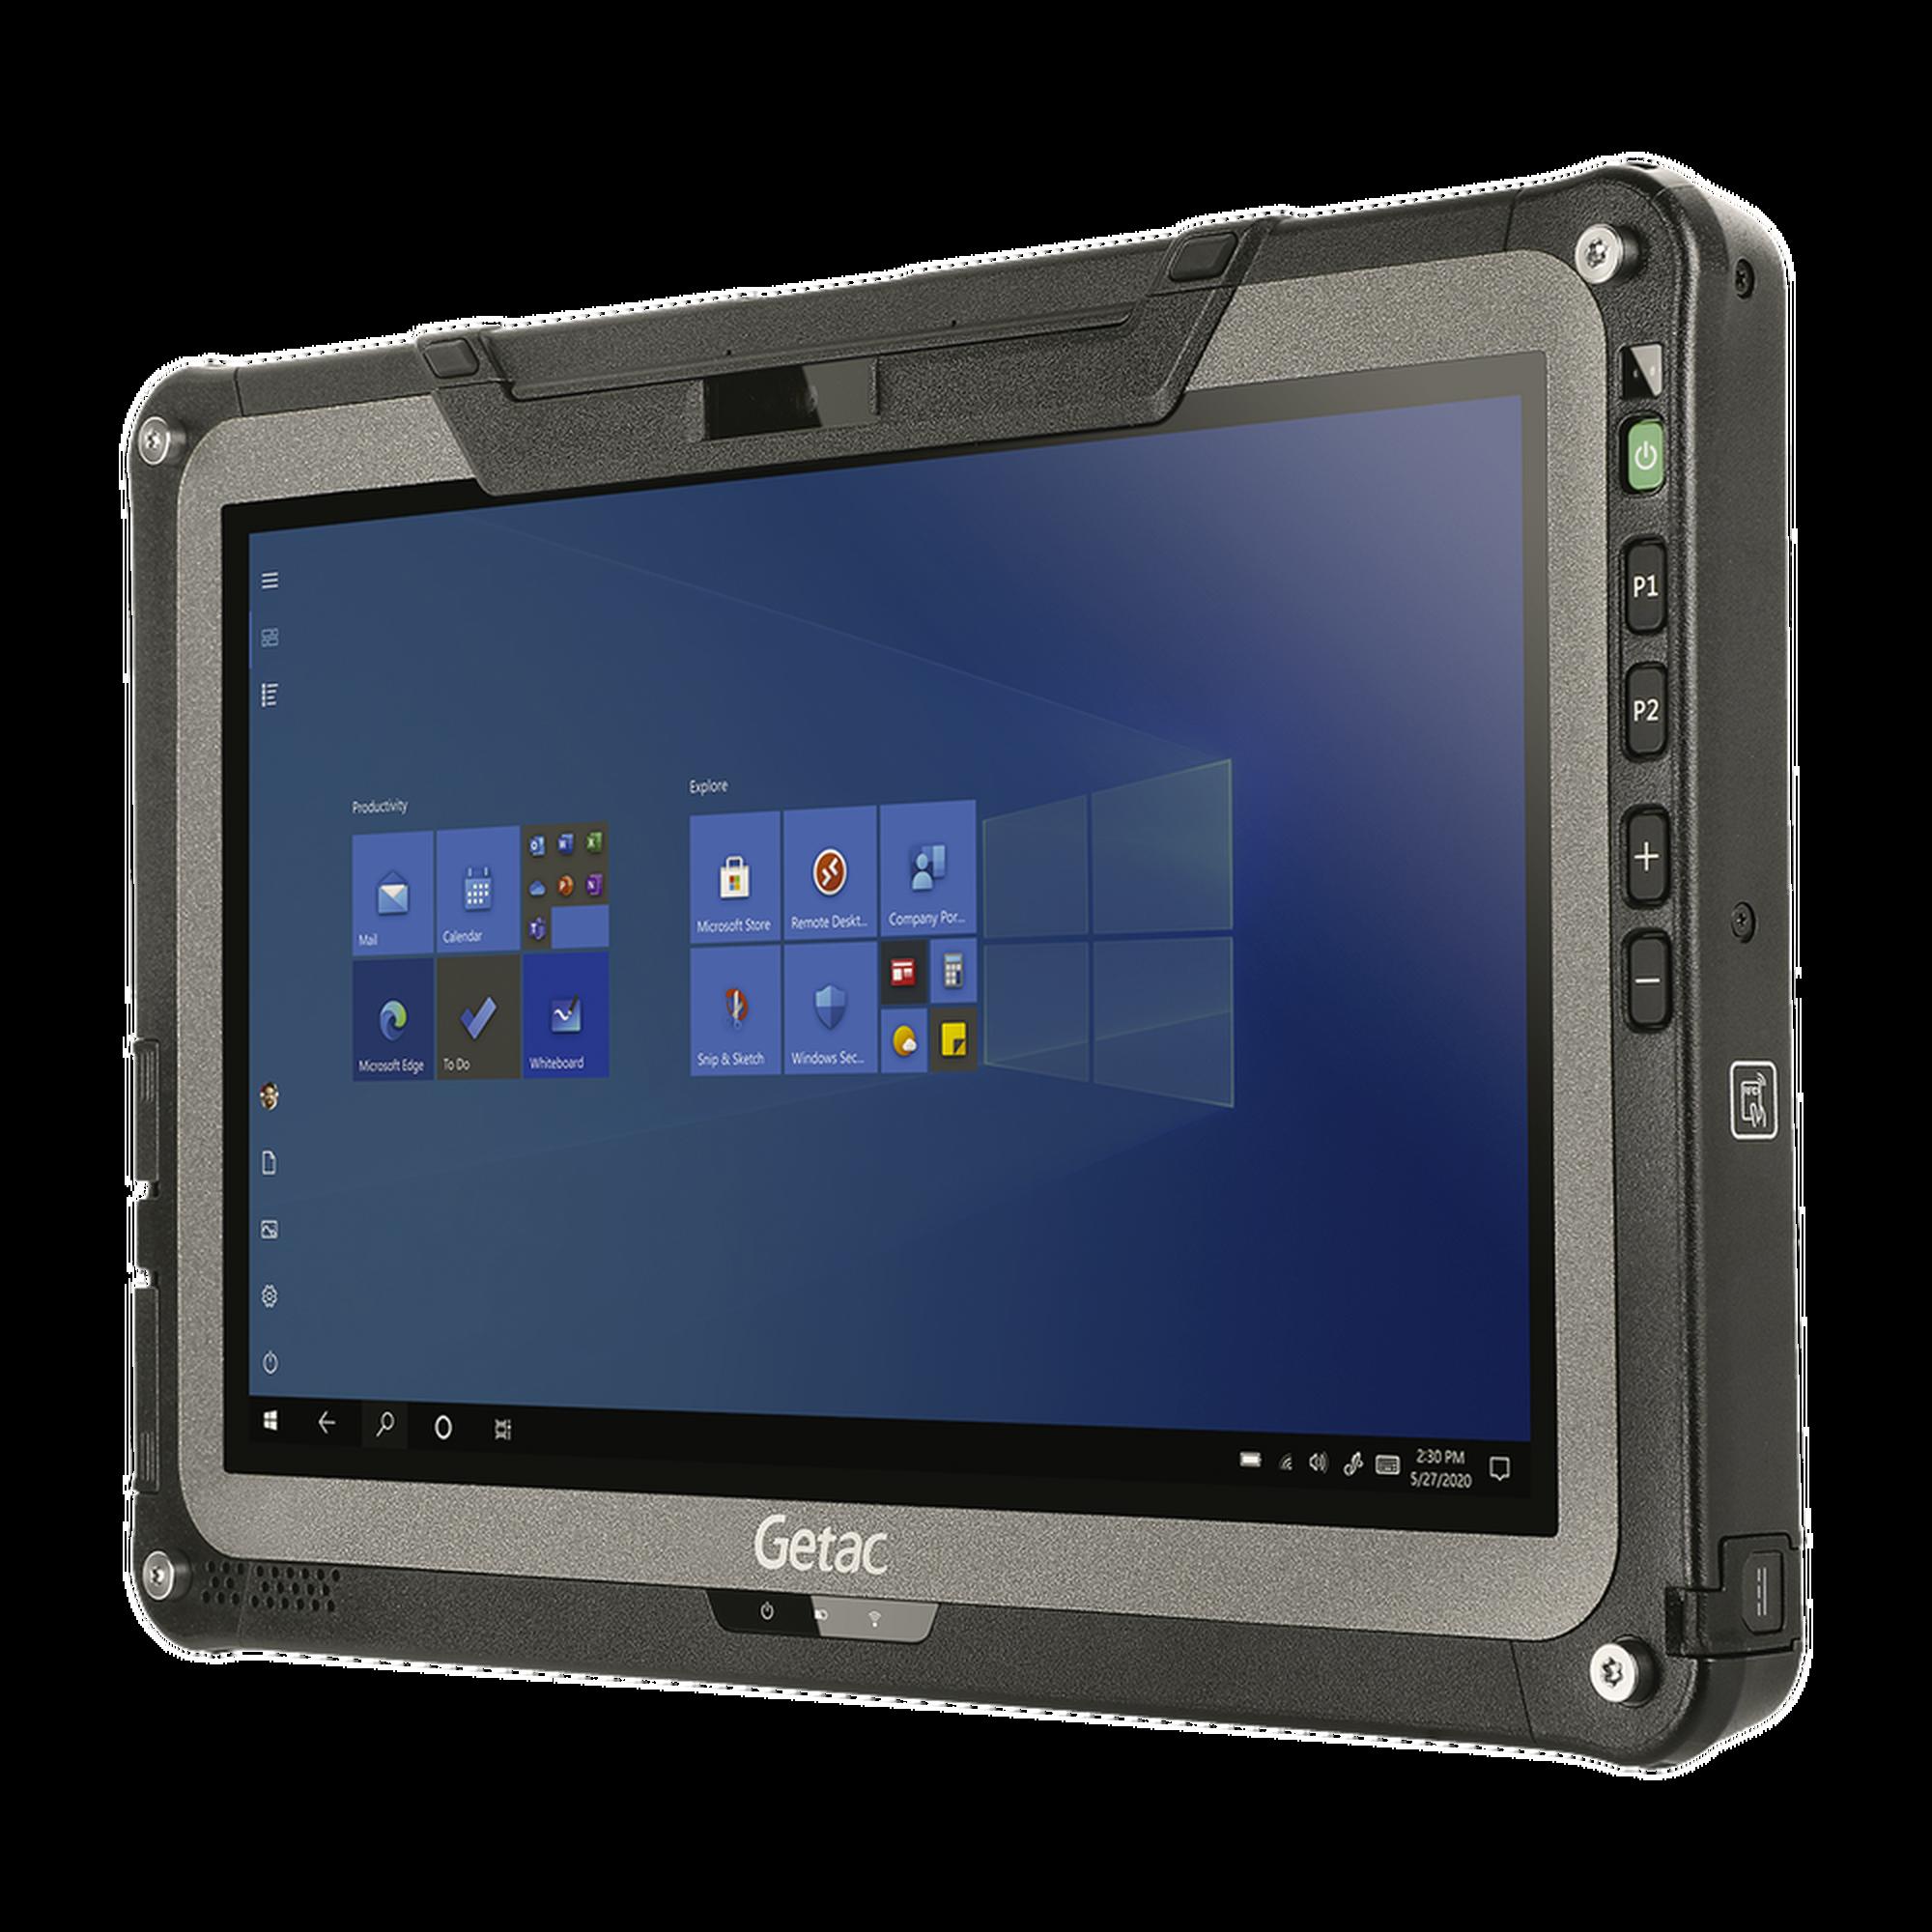 Tableta F110 G5 totalmente robusta / Pantalla 11.6 / Windows 10 / 8GB RAM / Procesador Intel Core  i5-8365U vPro